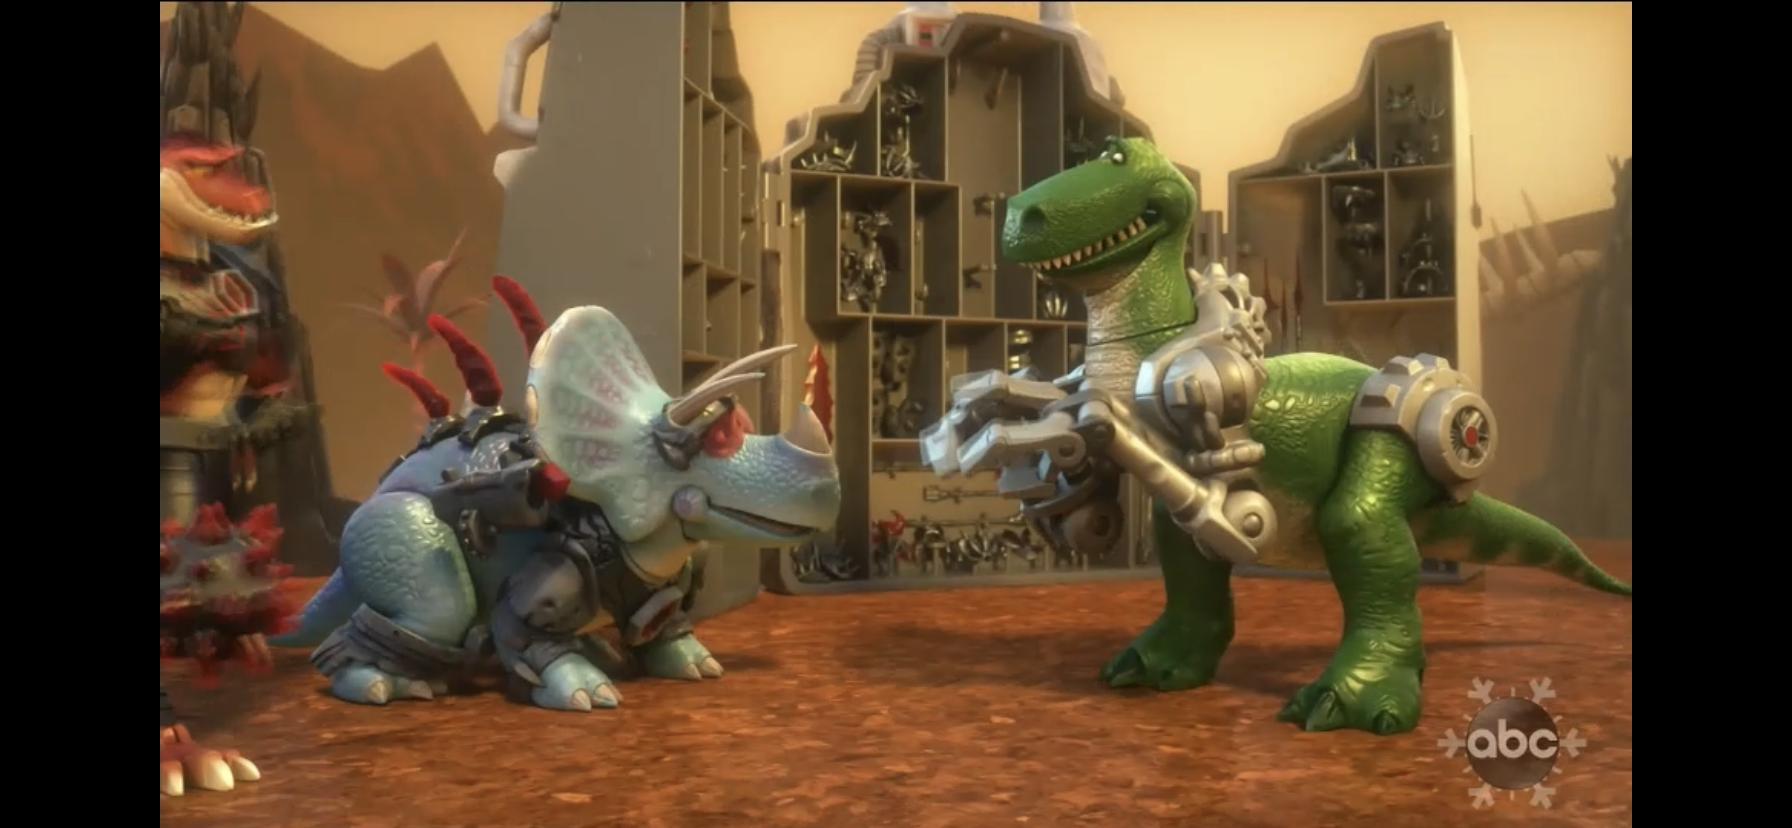 armored_trixie_rex